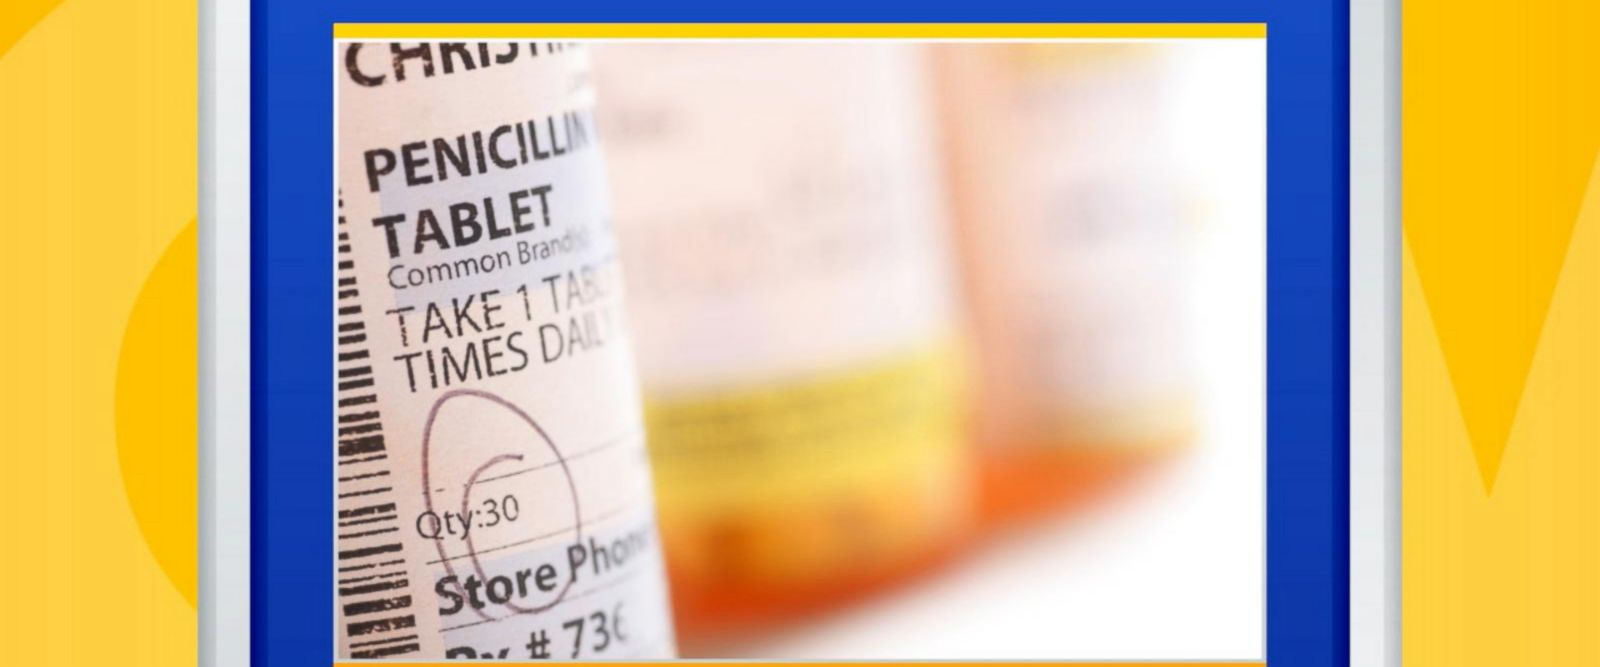 VIDEO: Are you actually allergic to penicillin?